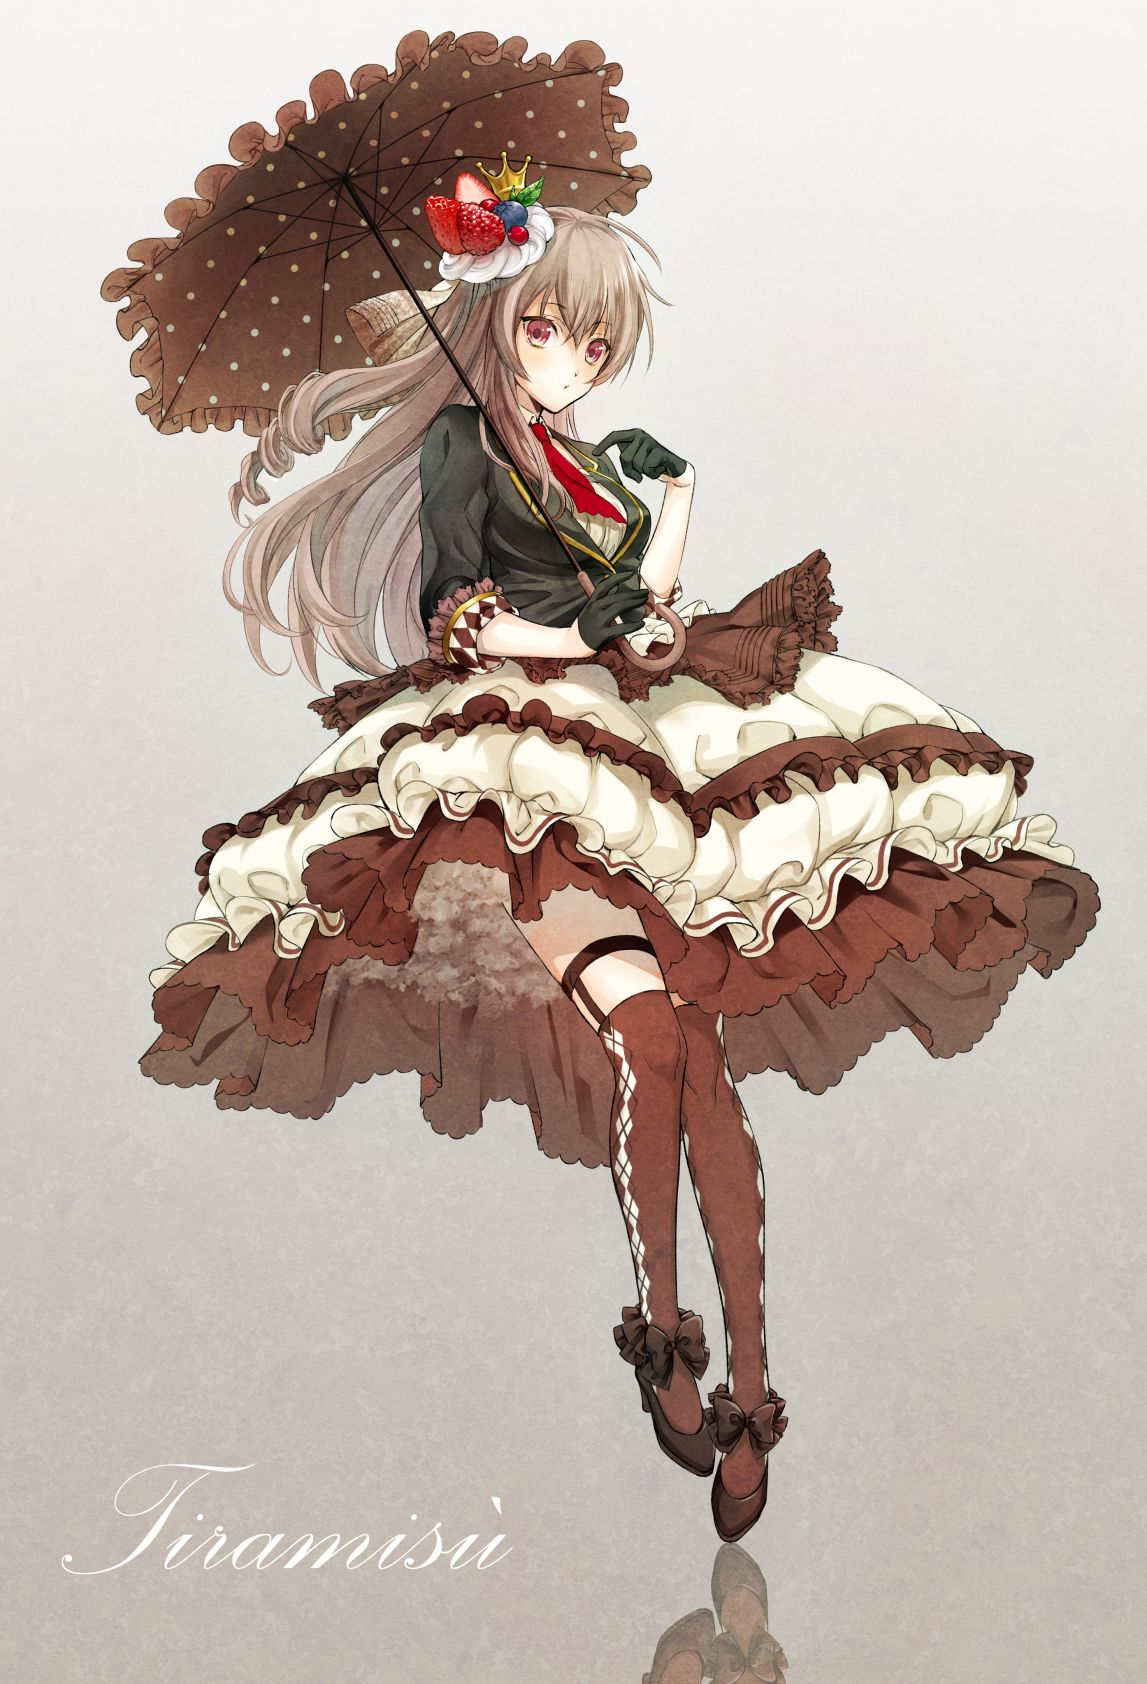 Pixiv Id 1723558/1865911 Zerochan Anime, Anime images